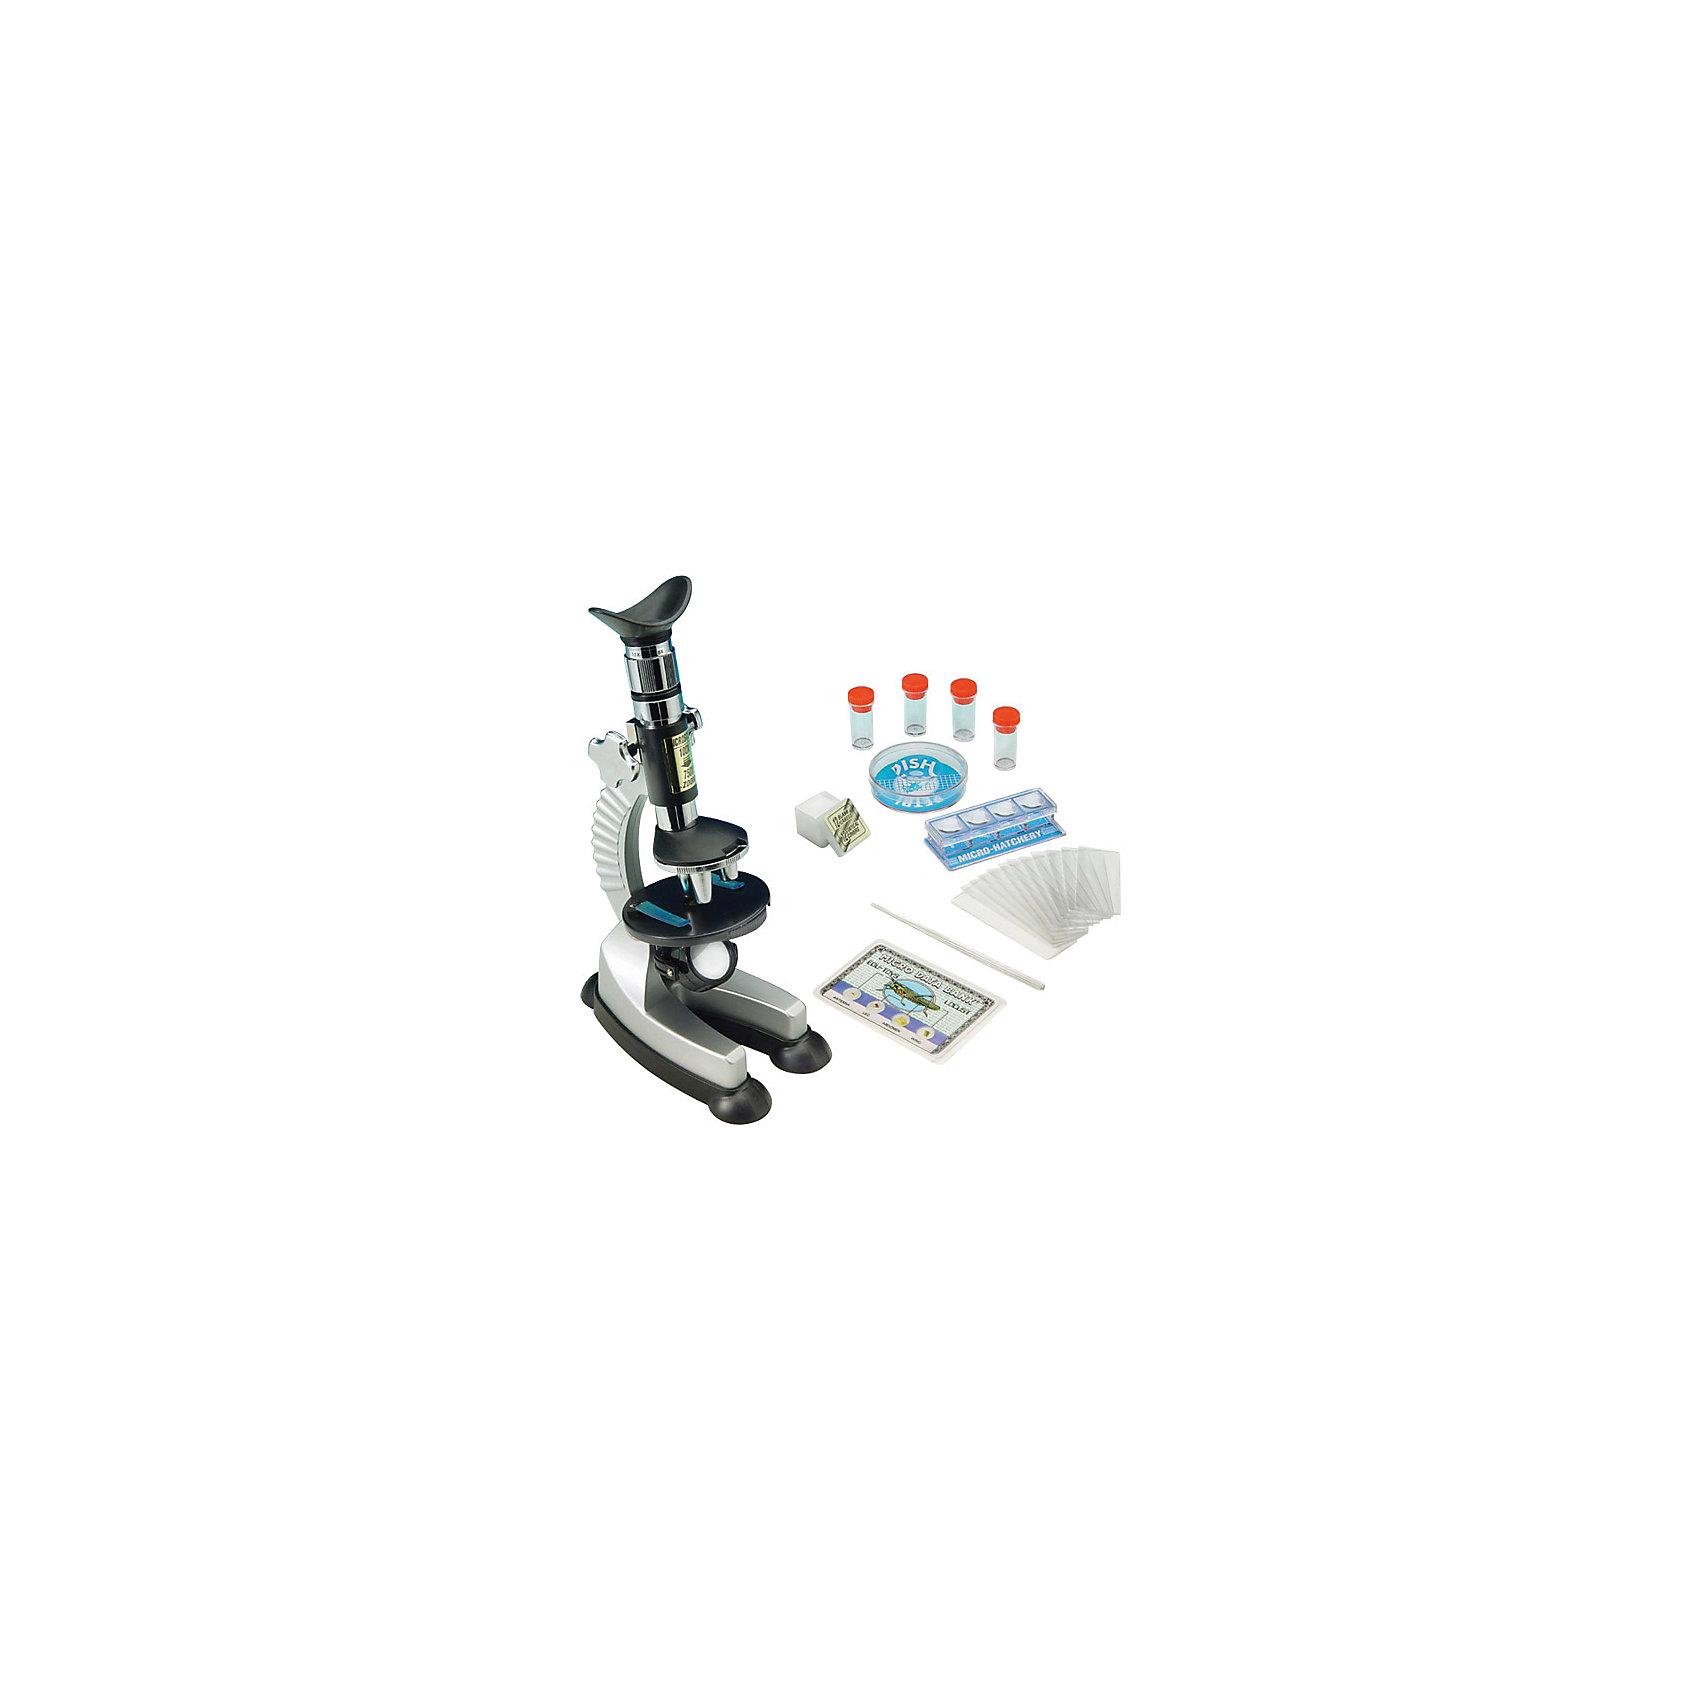 Микроскоп 100*750, Edu-Toys от myToys